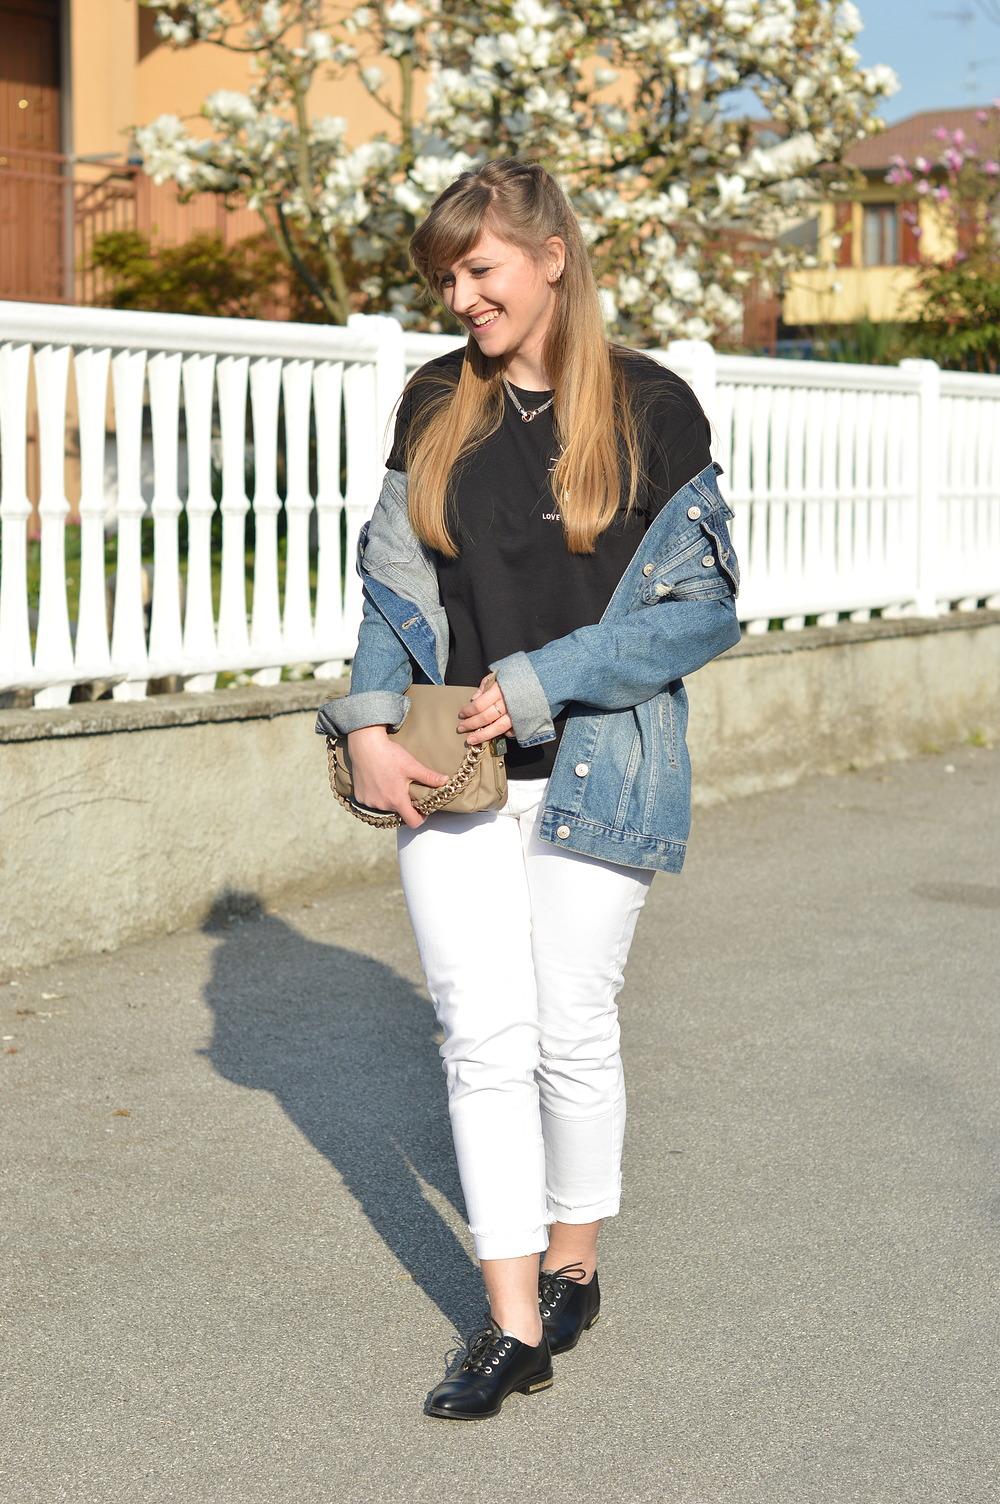 White jeans u0026 denim jacket itu0026#39;s a good idea. - The Dress Sense